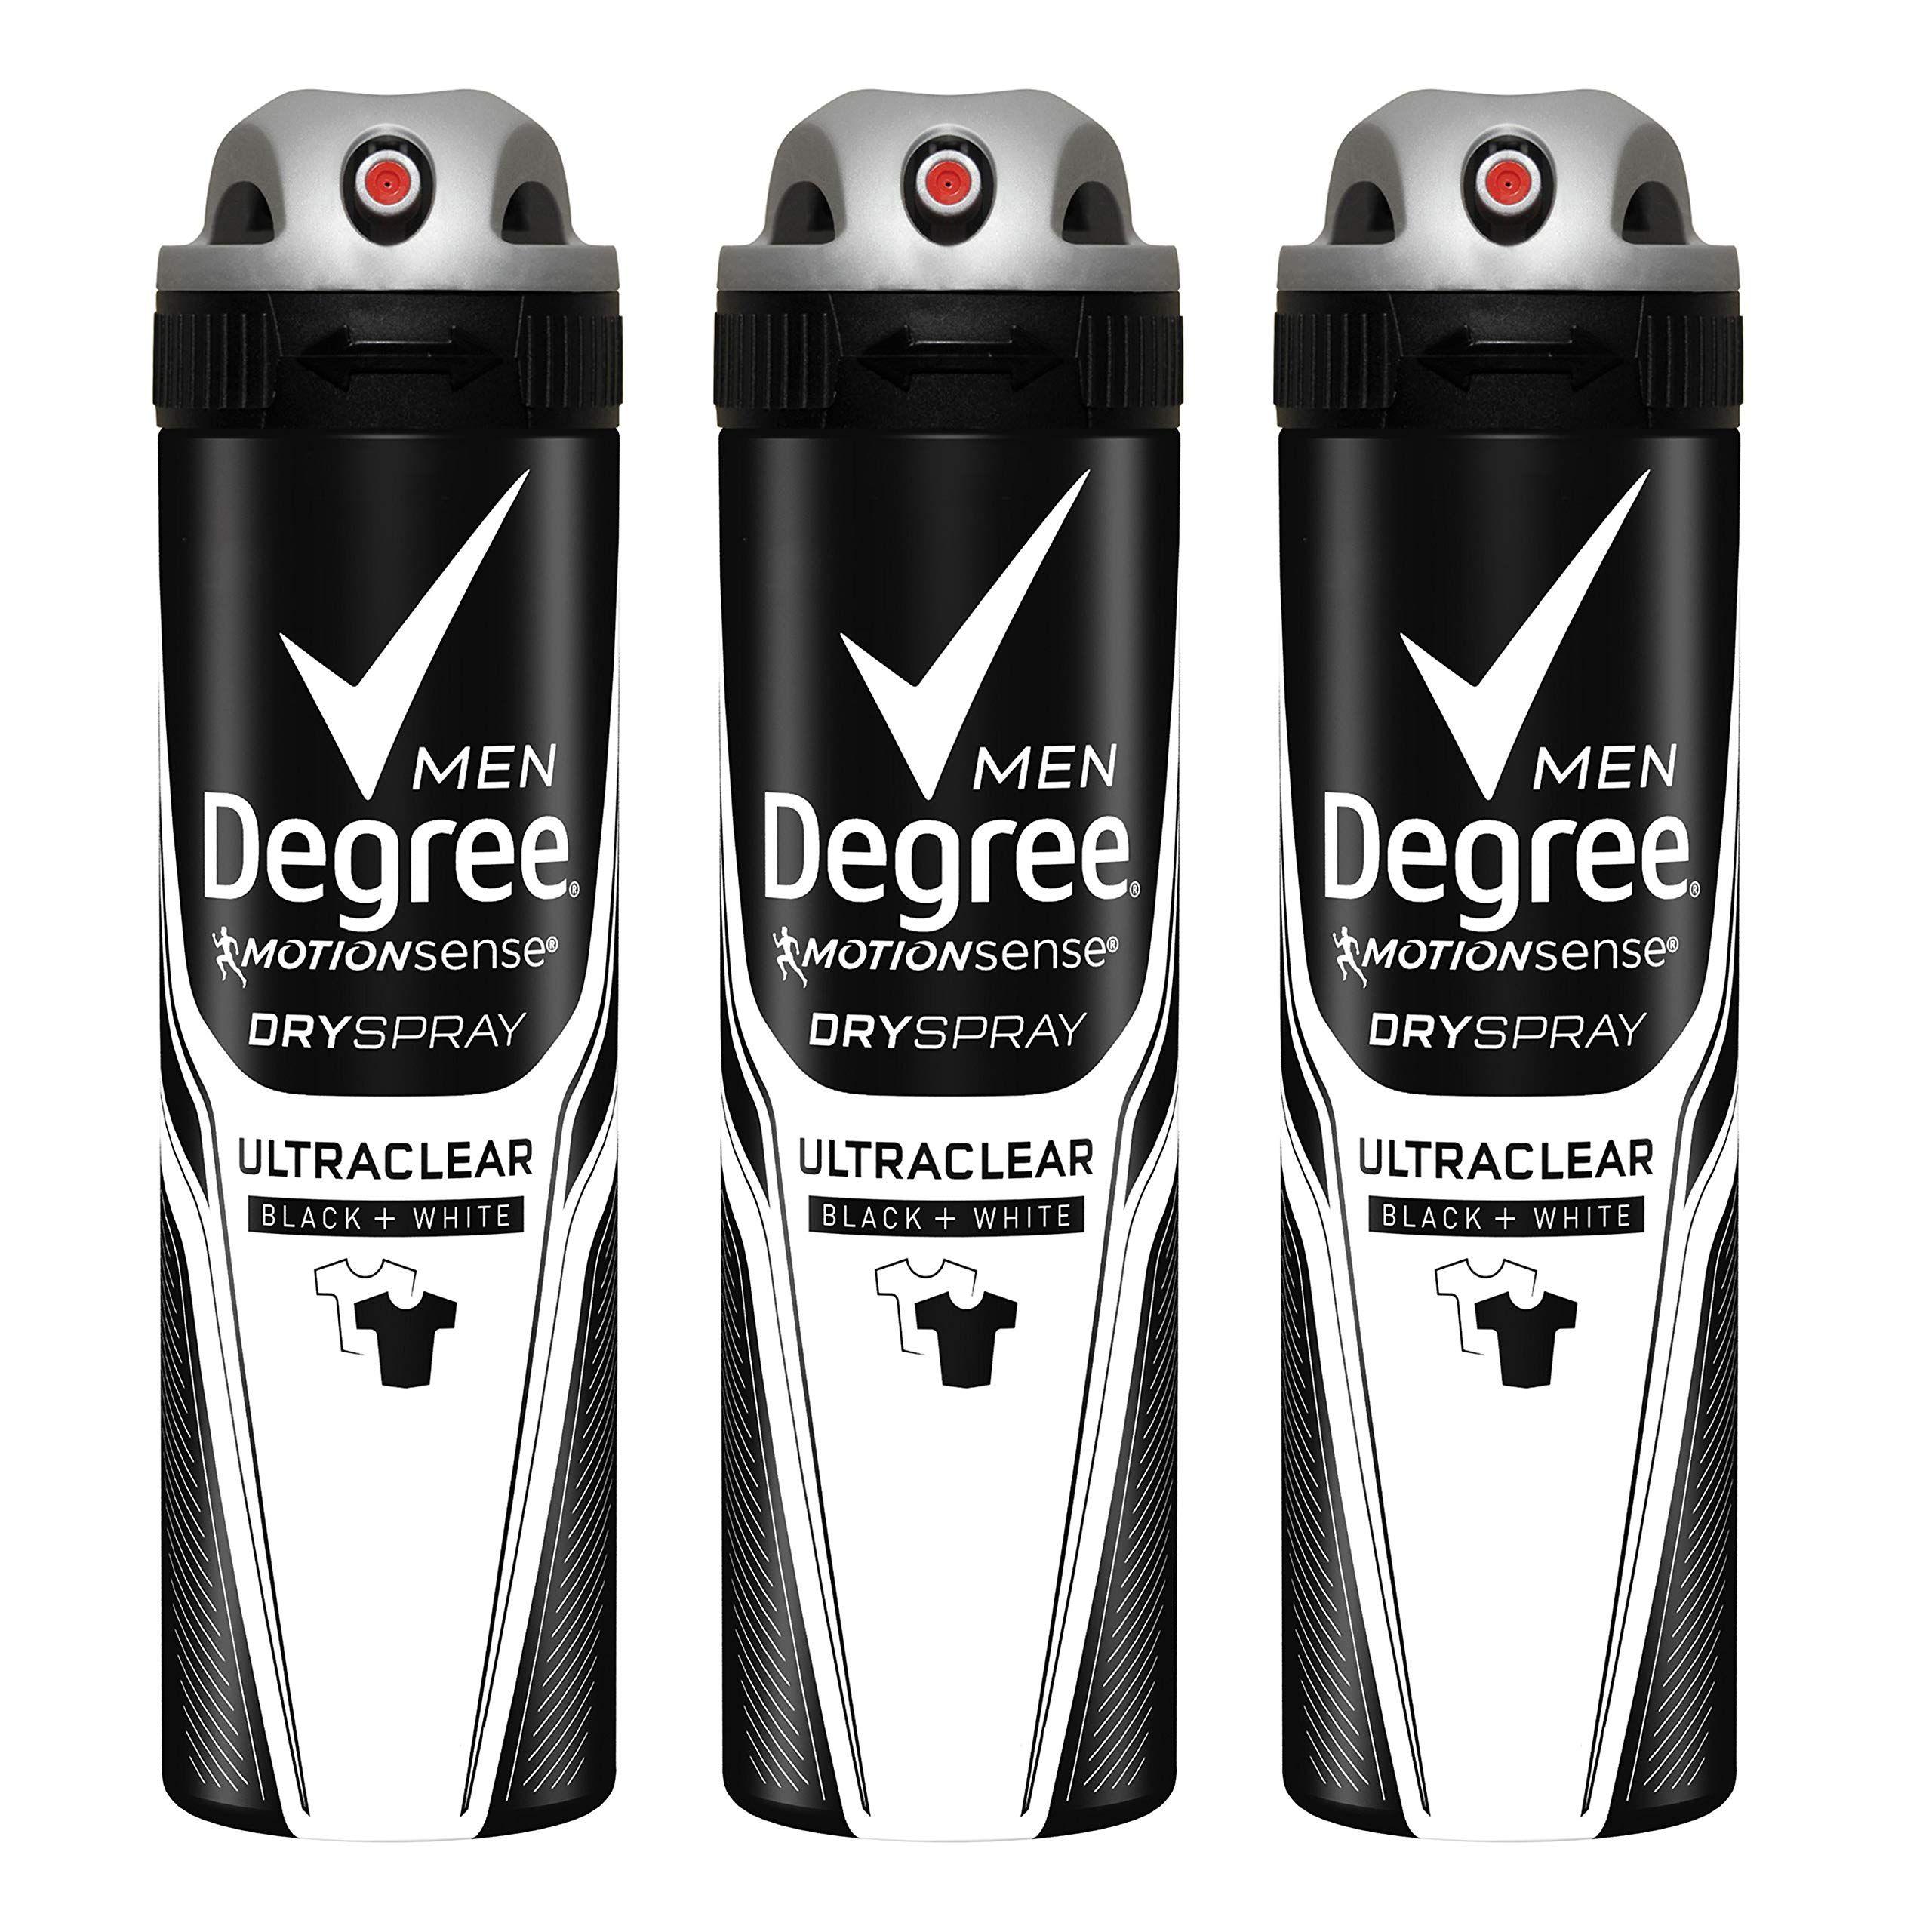 Degree Men Motionsense Antiperspirant Deodorant Dry Spray